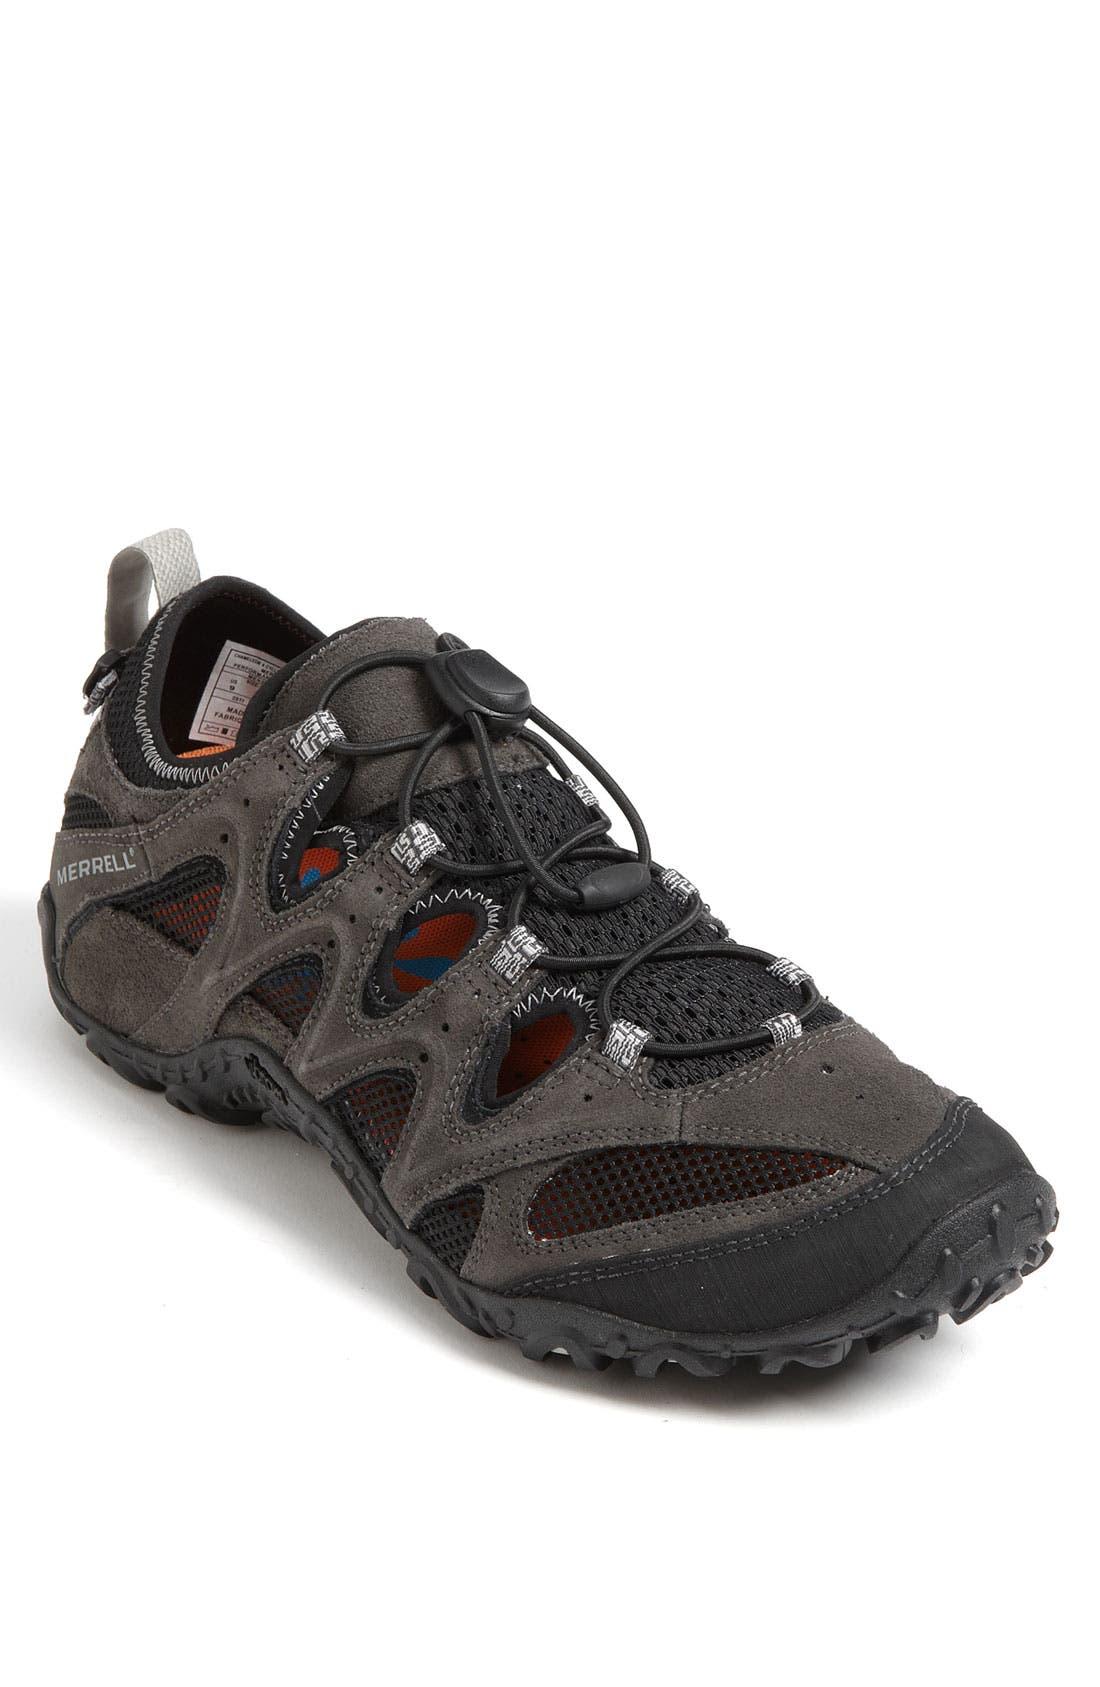 Alternate Image 1 Selected - Merrell 'Chameleon Cyclone' Hiking Shoe (Men)